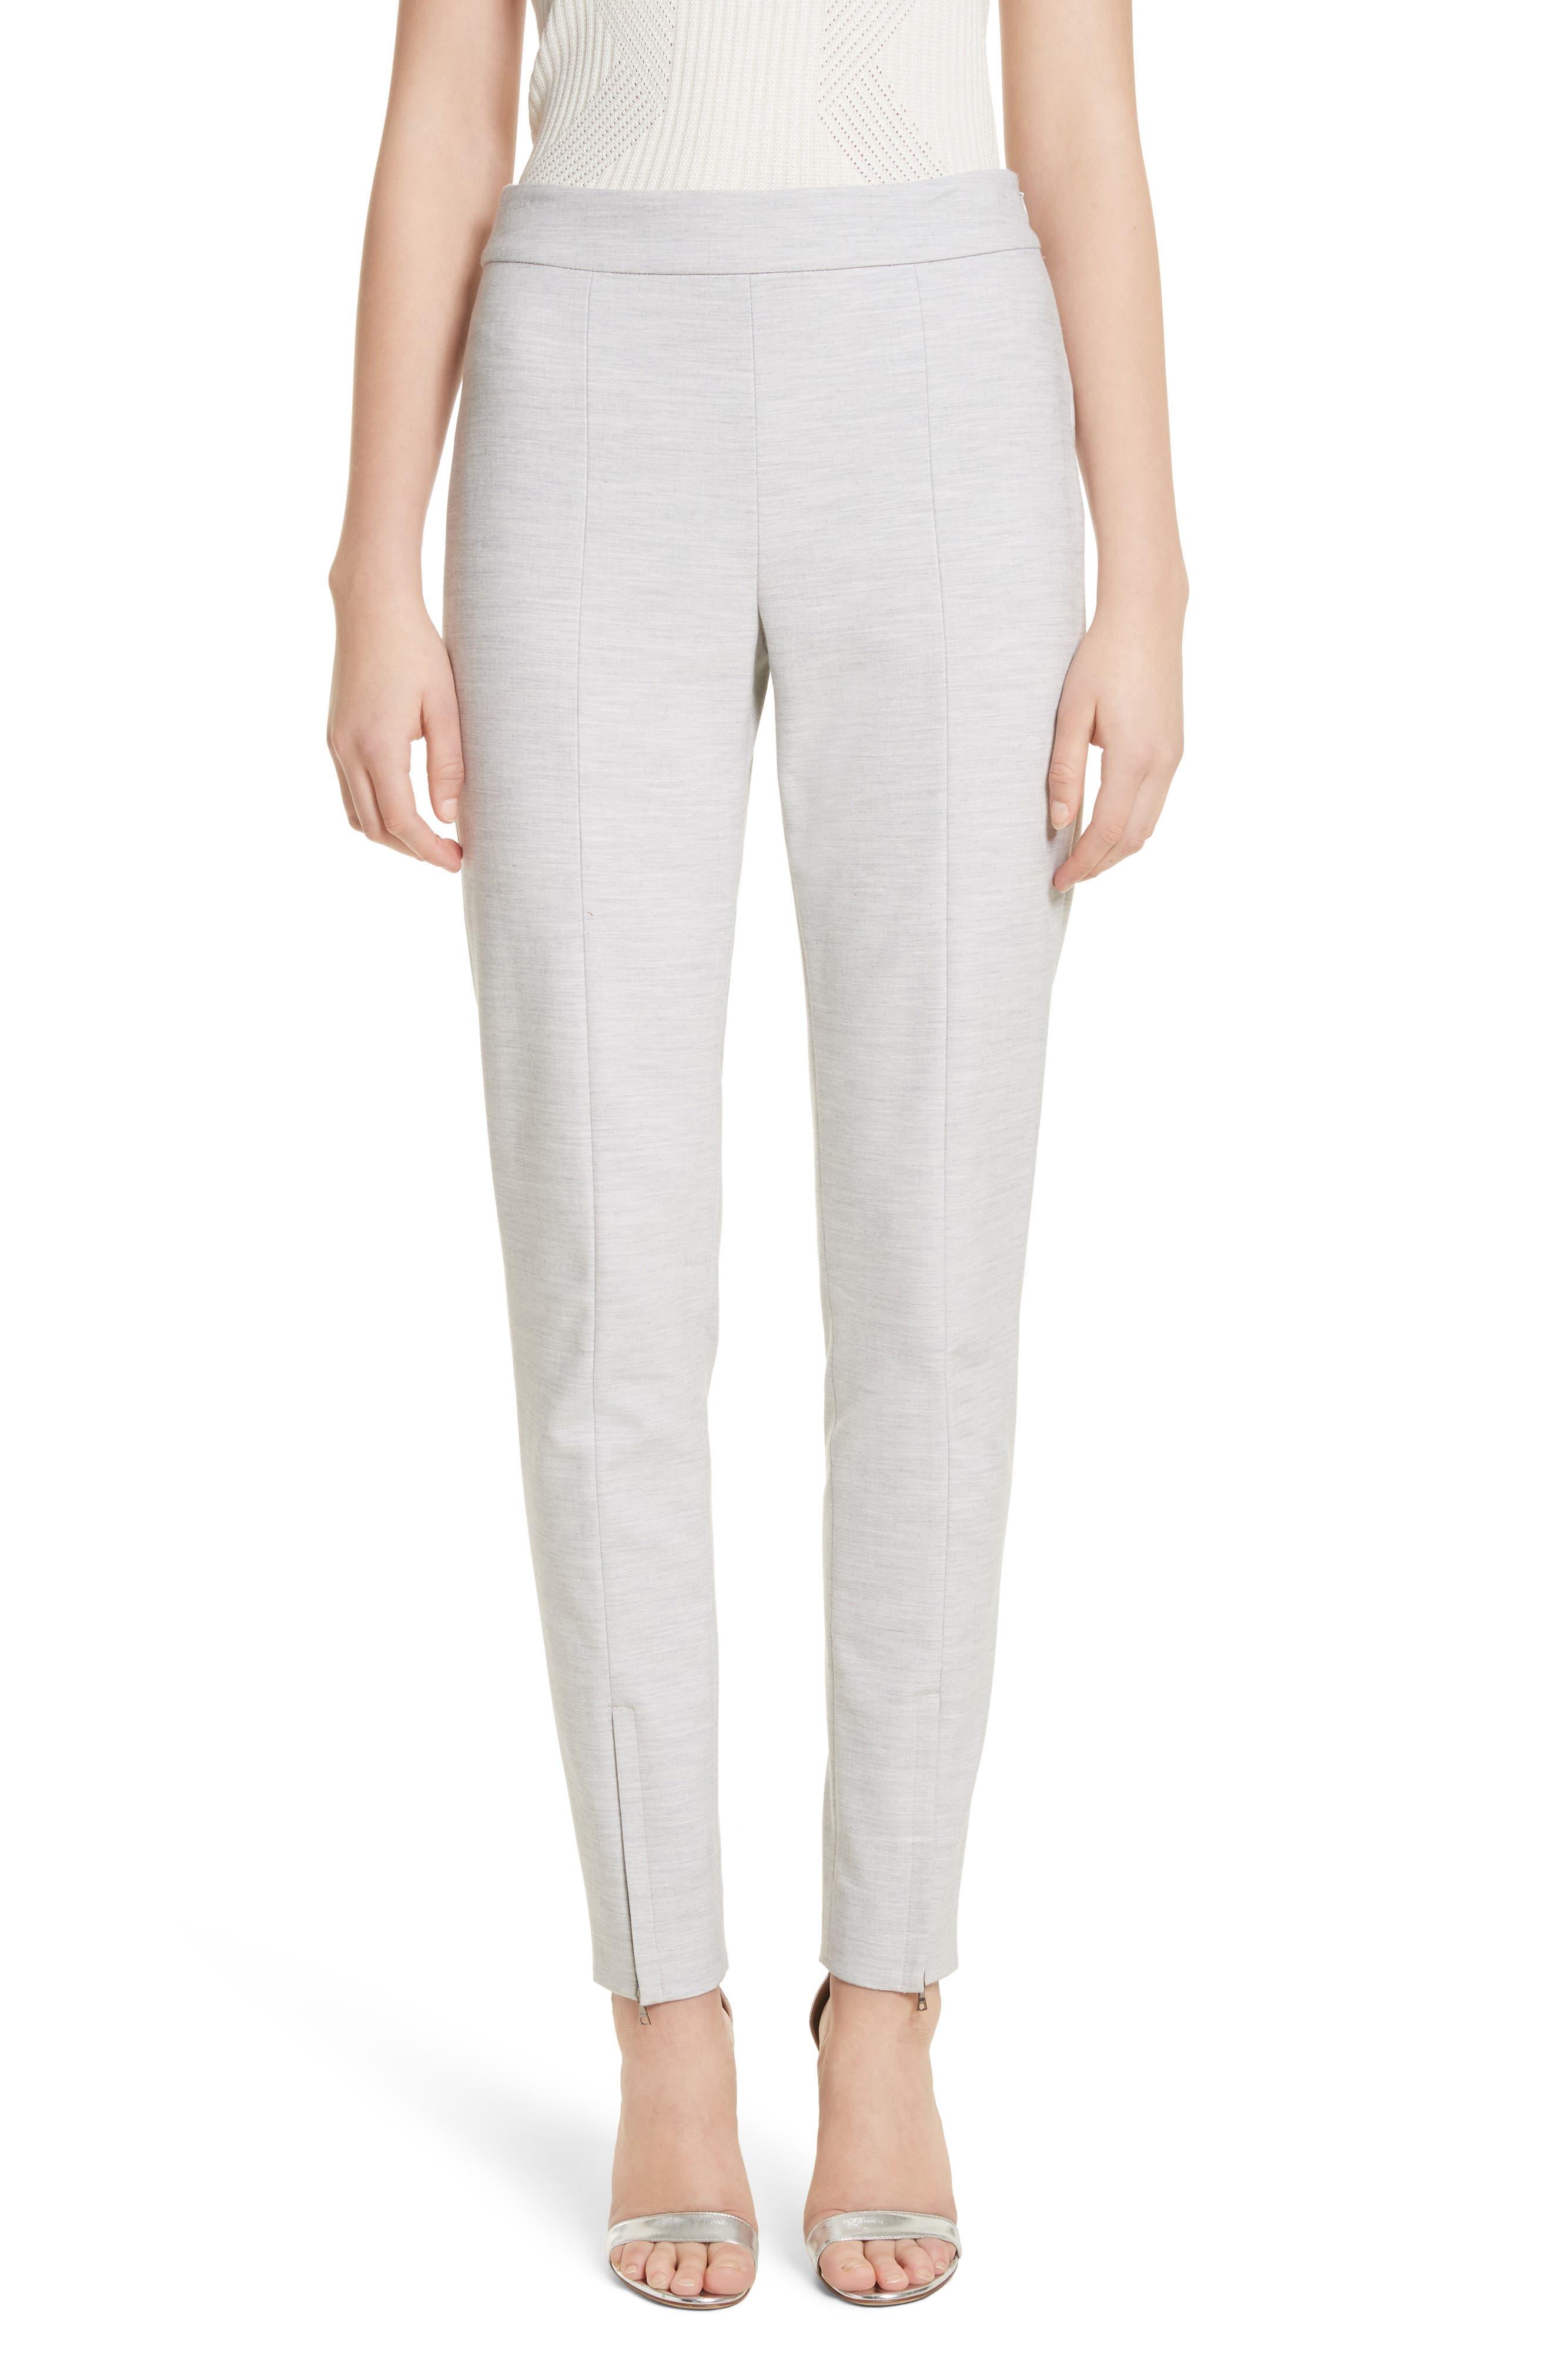 Summer Bella Double Weave Pants,                         Main,                         color, Light Grey Melange